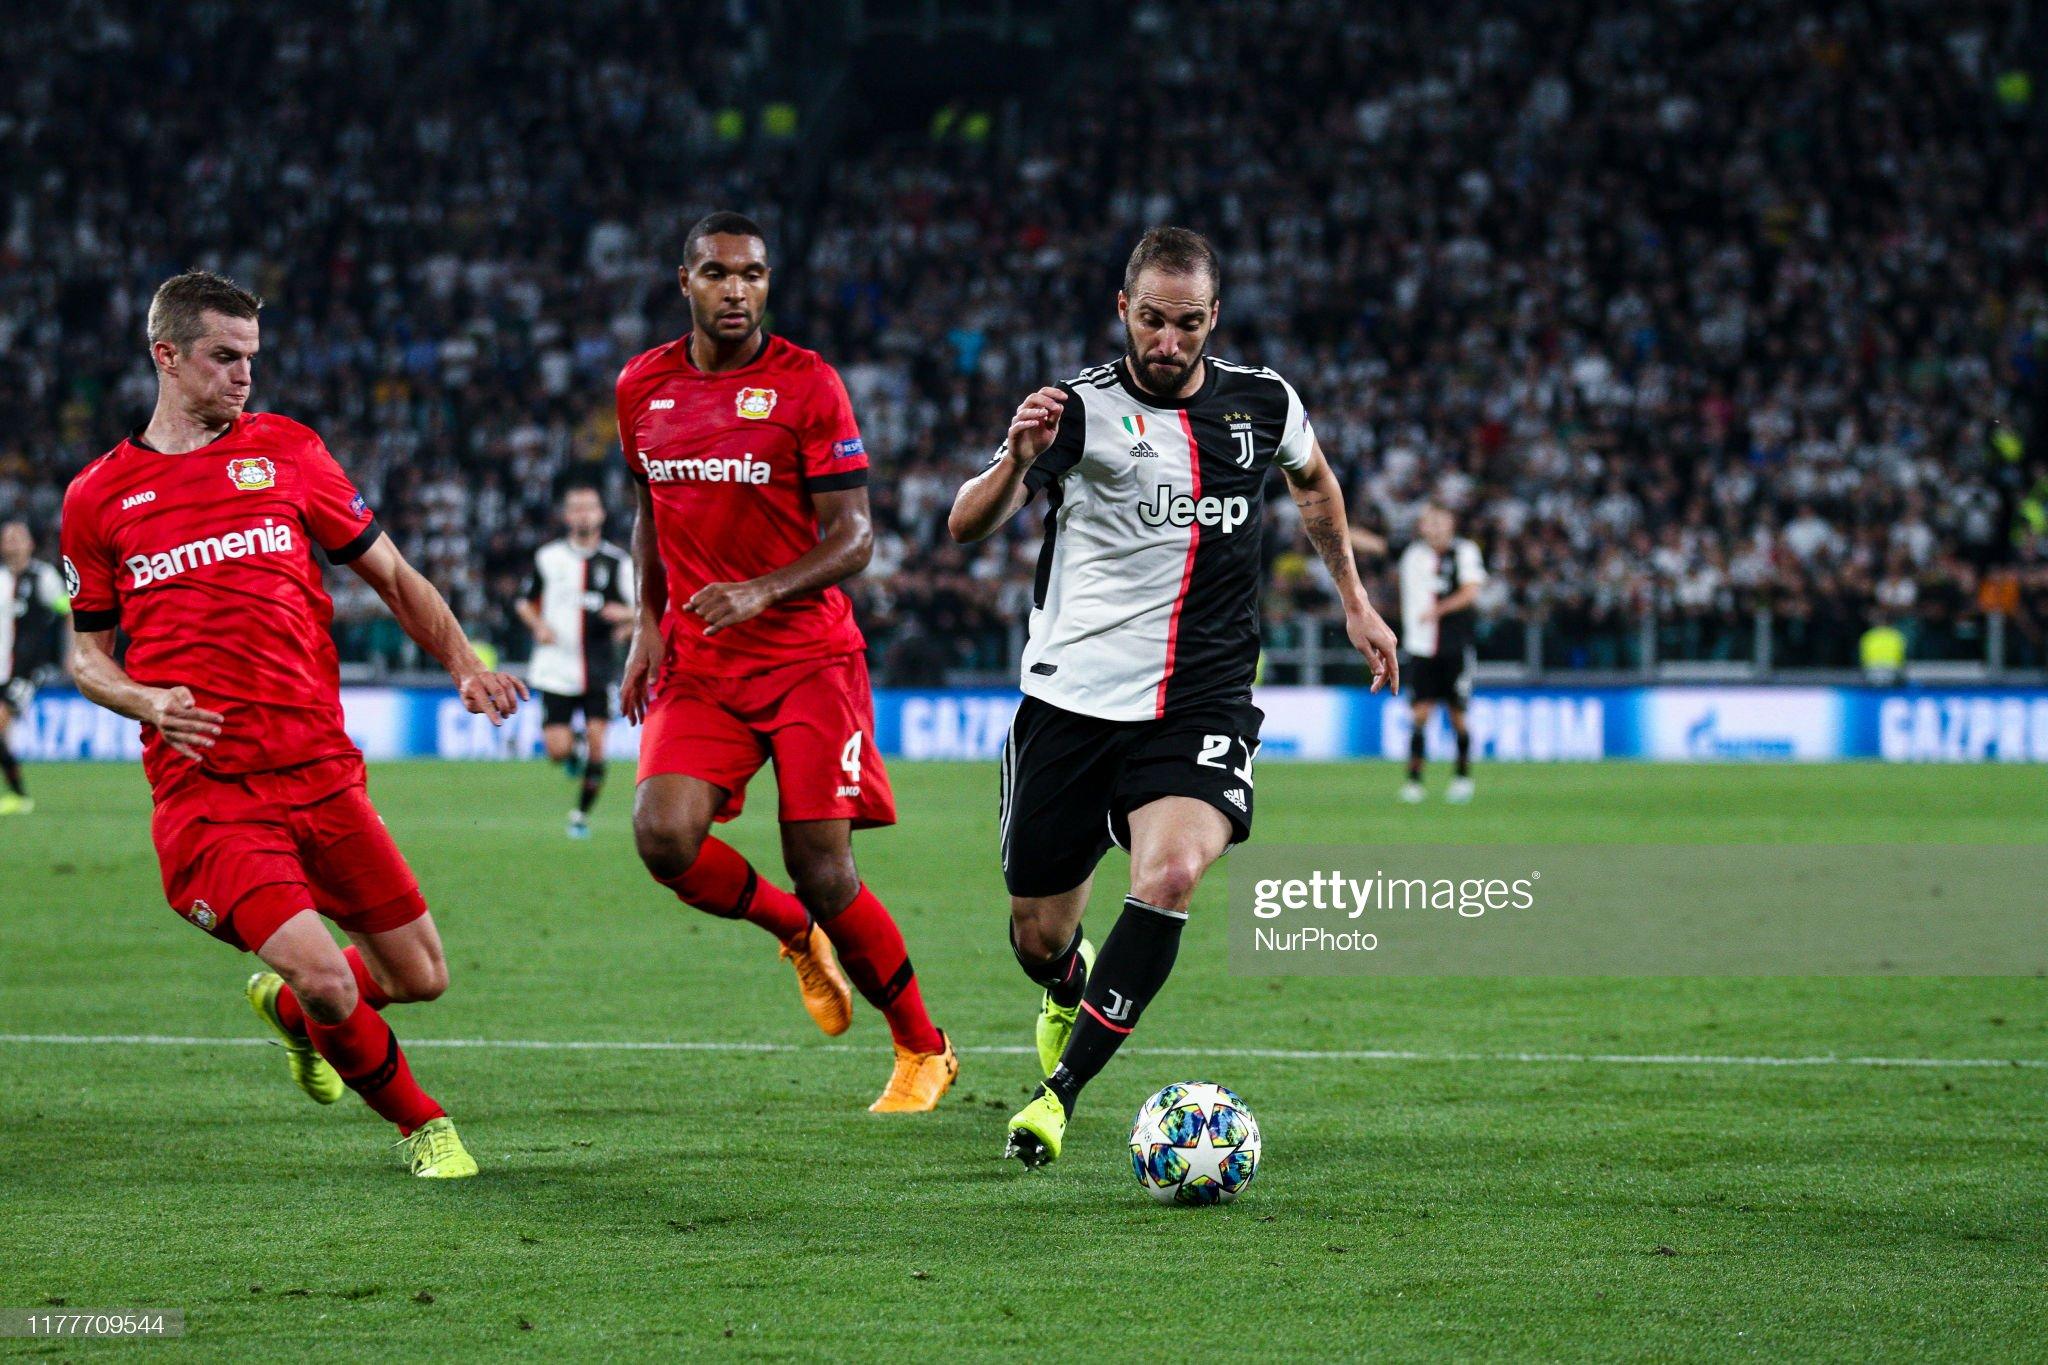 Bayer Leverkusen v Juventus preview, prediction and odds